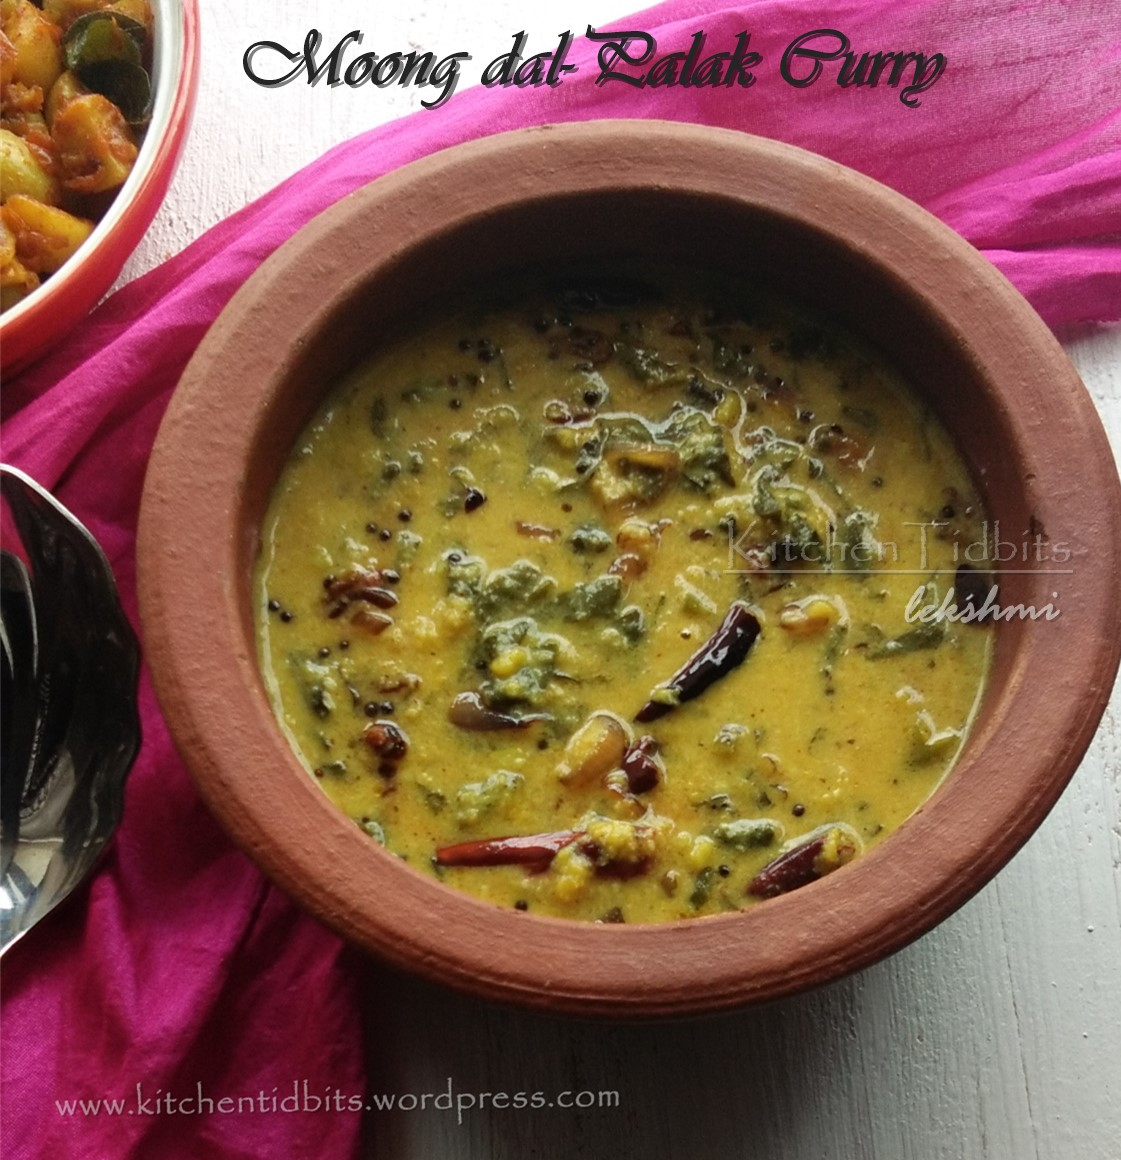 Moong dal-Palak Curry/ Cherupayar Parippu Palak curry -kerala style